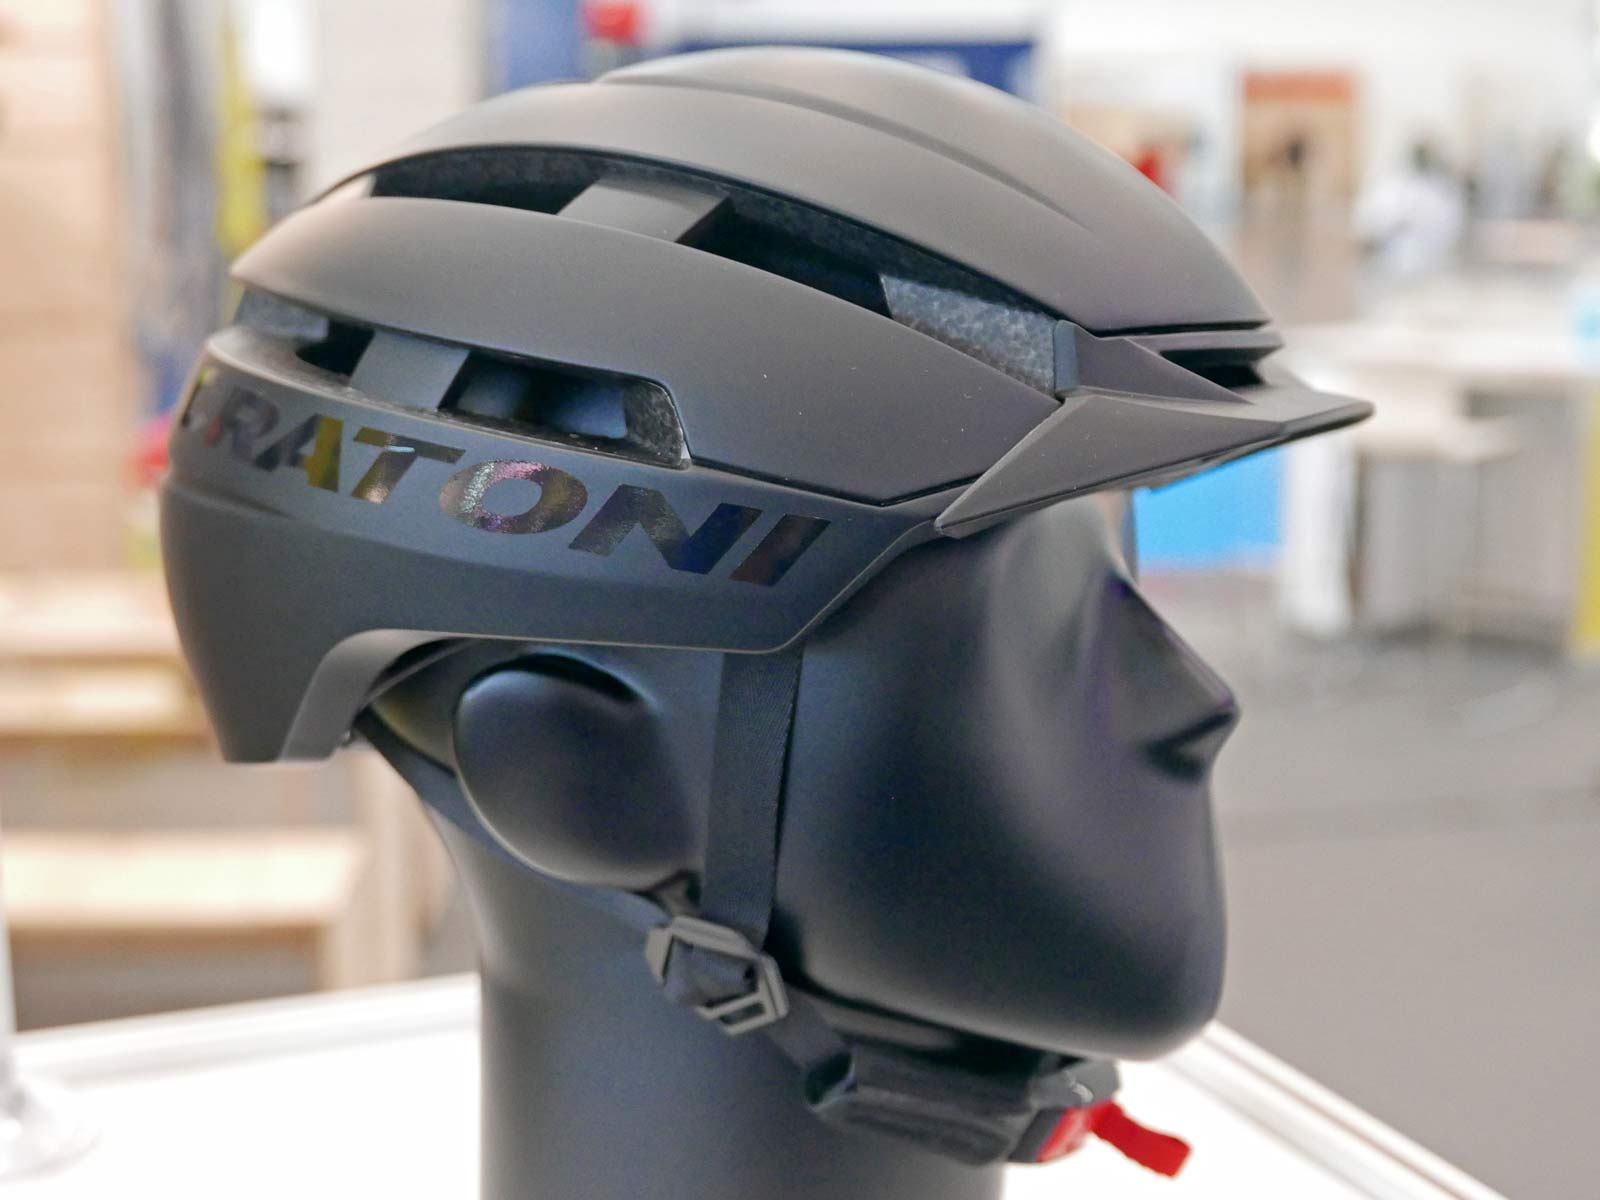 C-Loom 2.0 urban city bike helmet